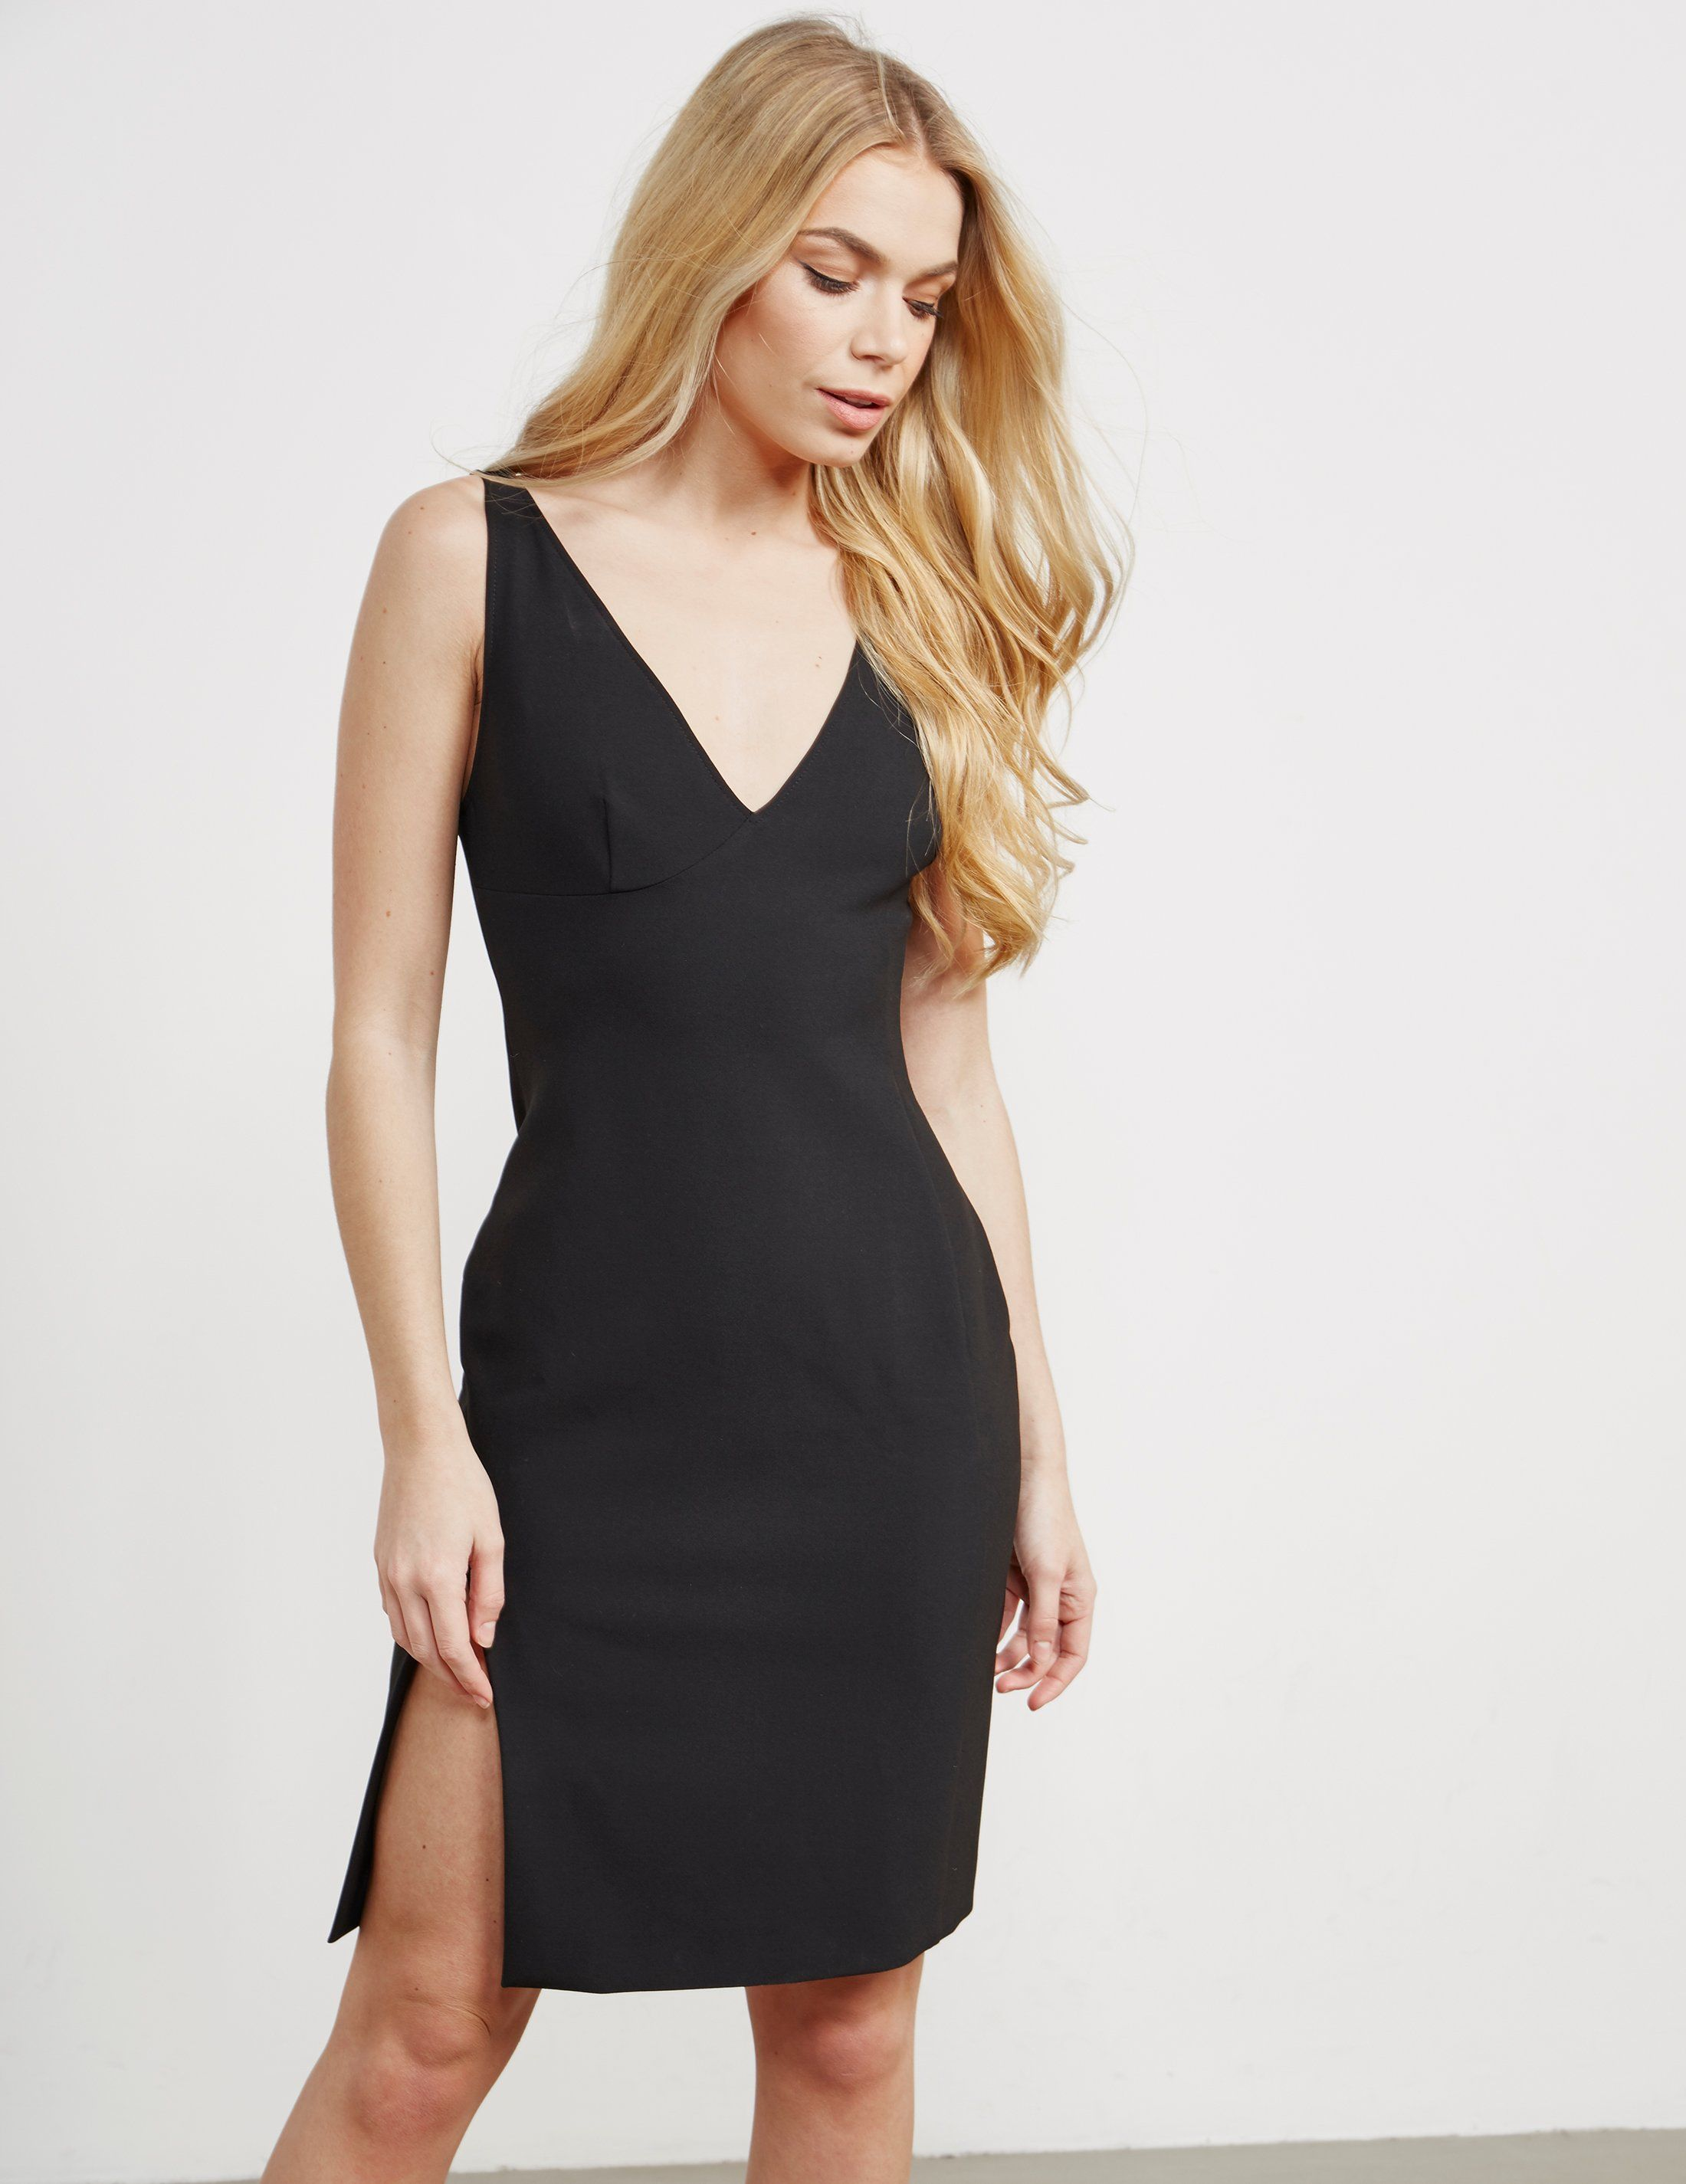 Versace Woven V-Neck Dress